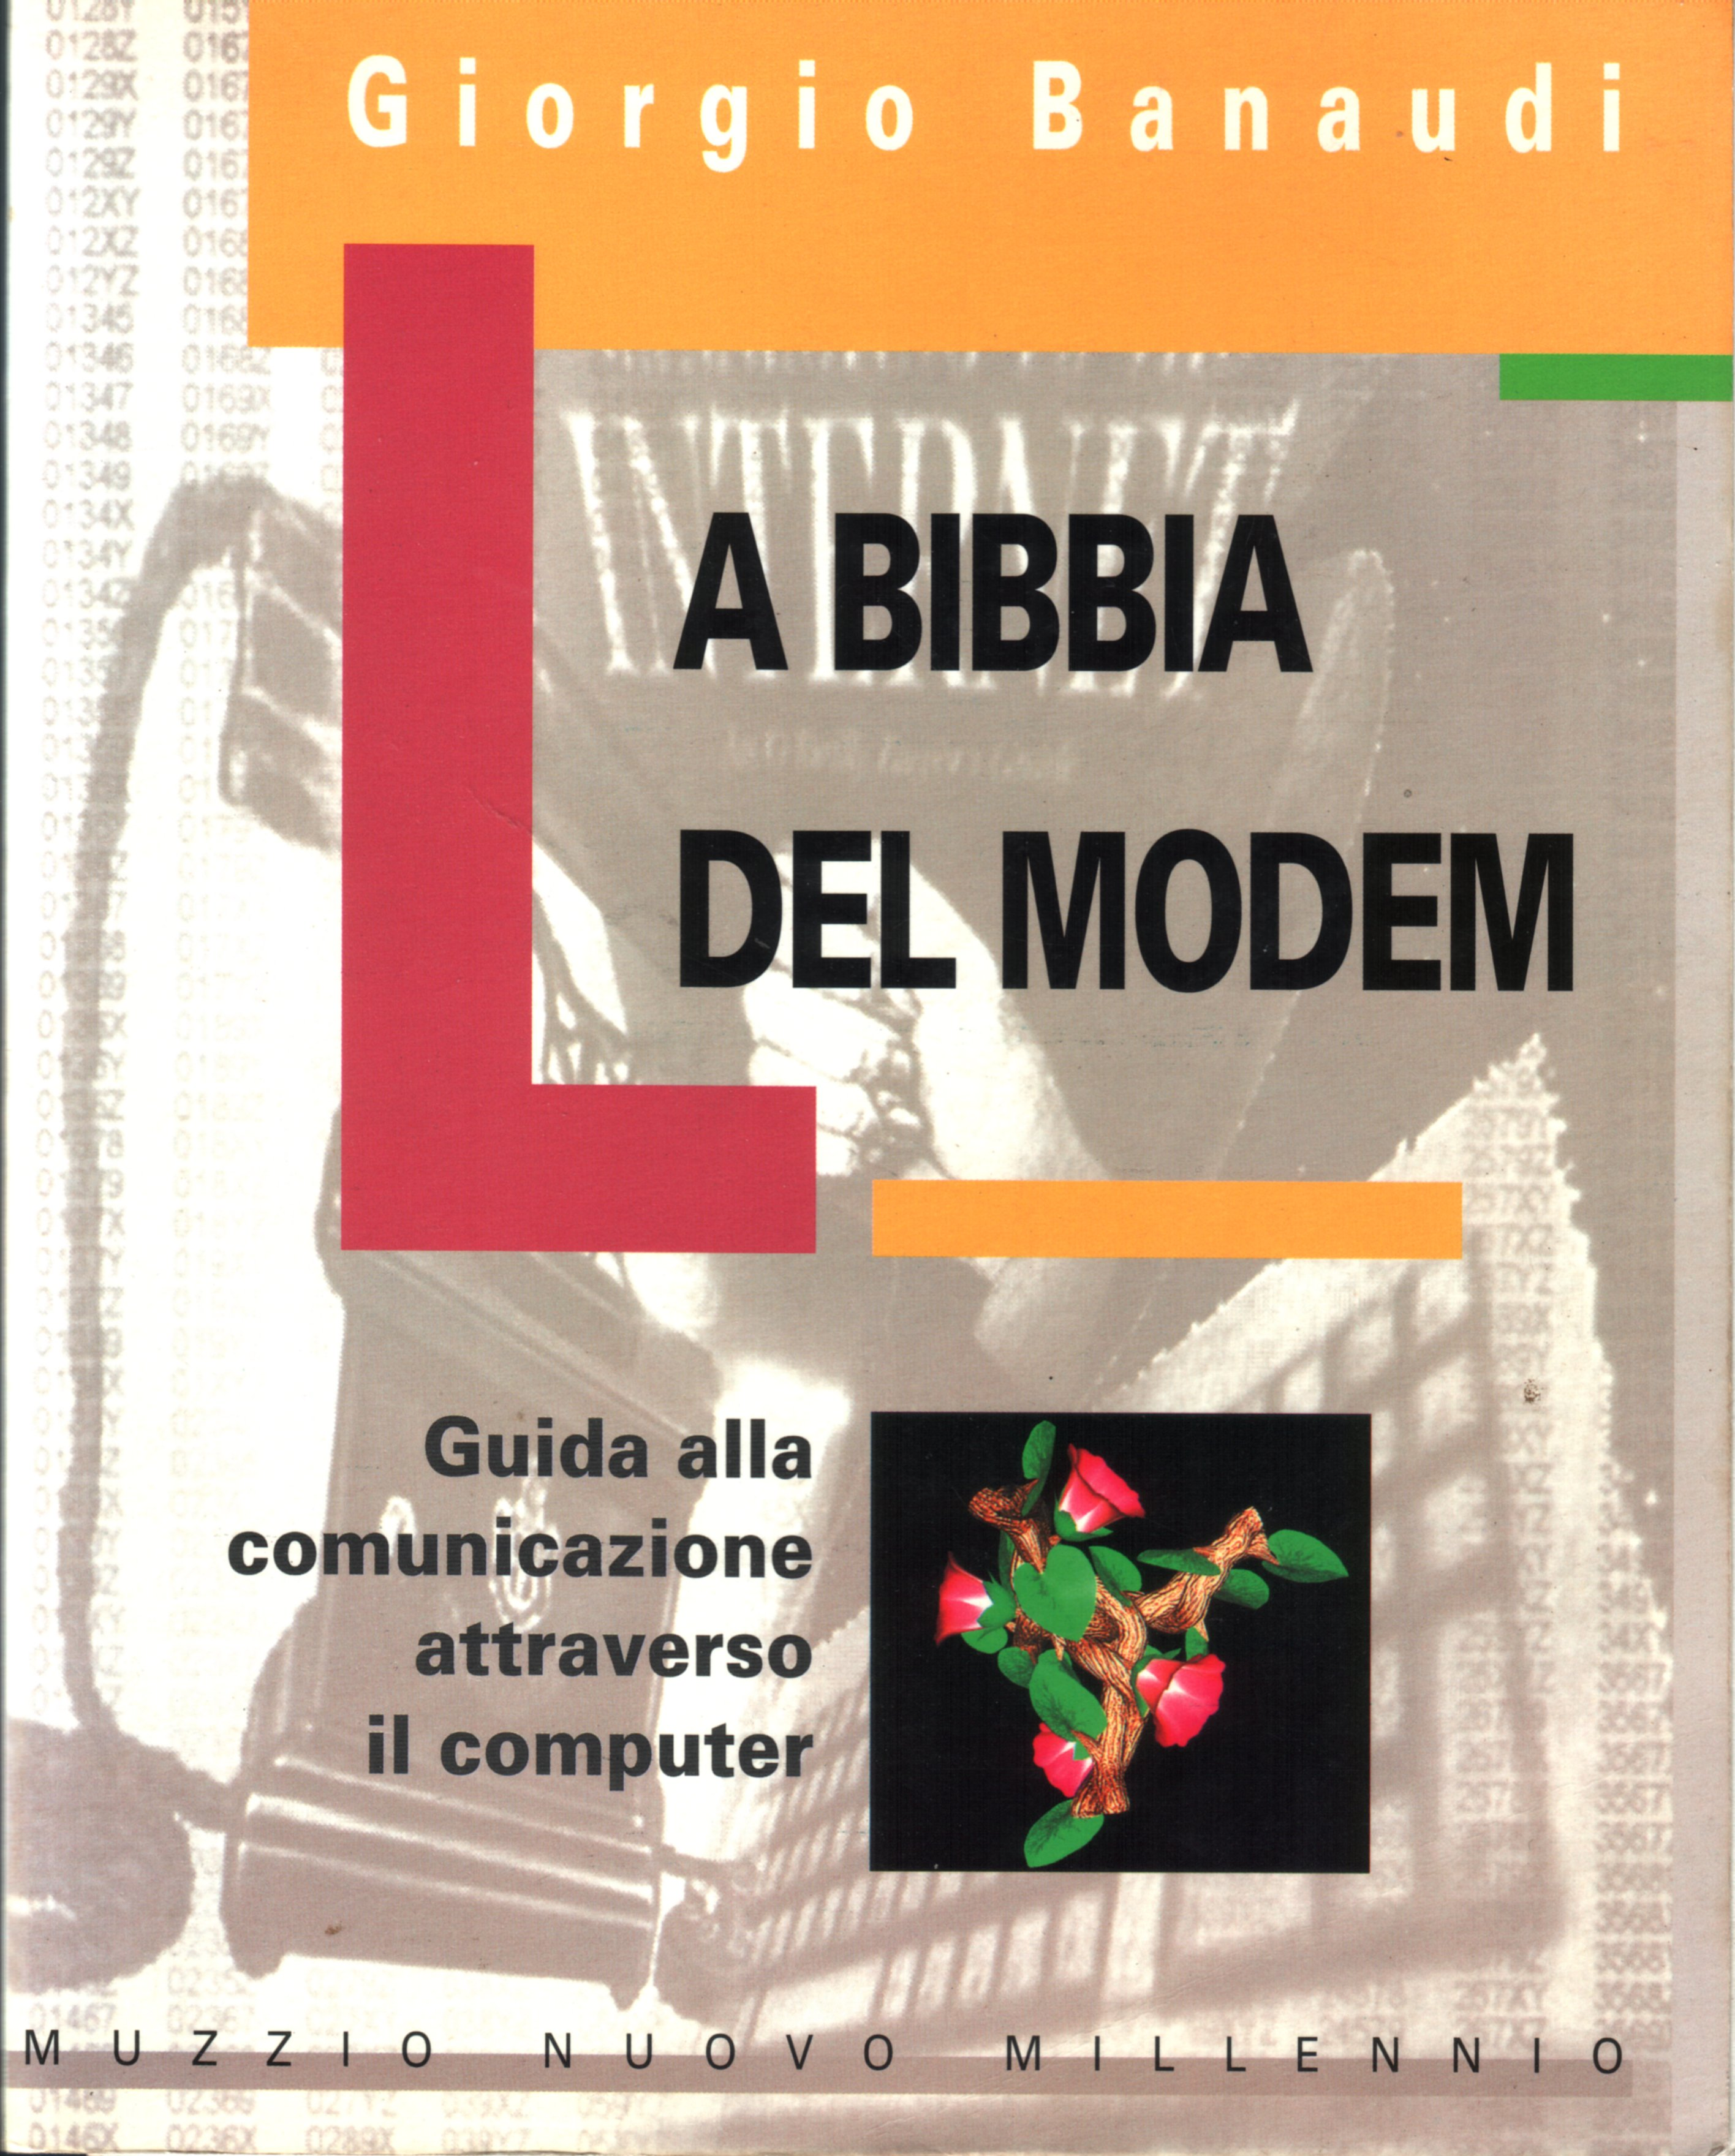 La bibbia del modem